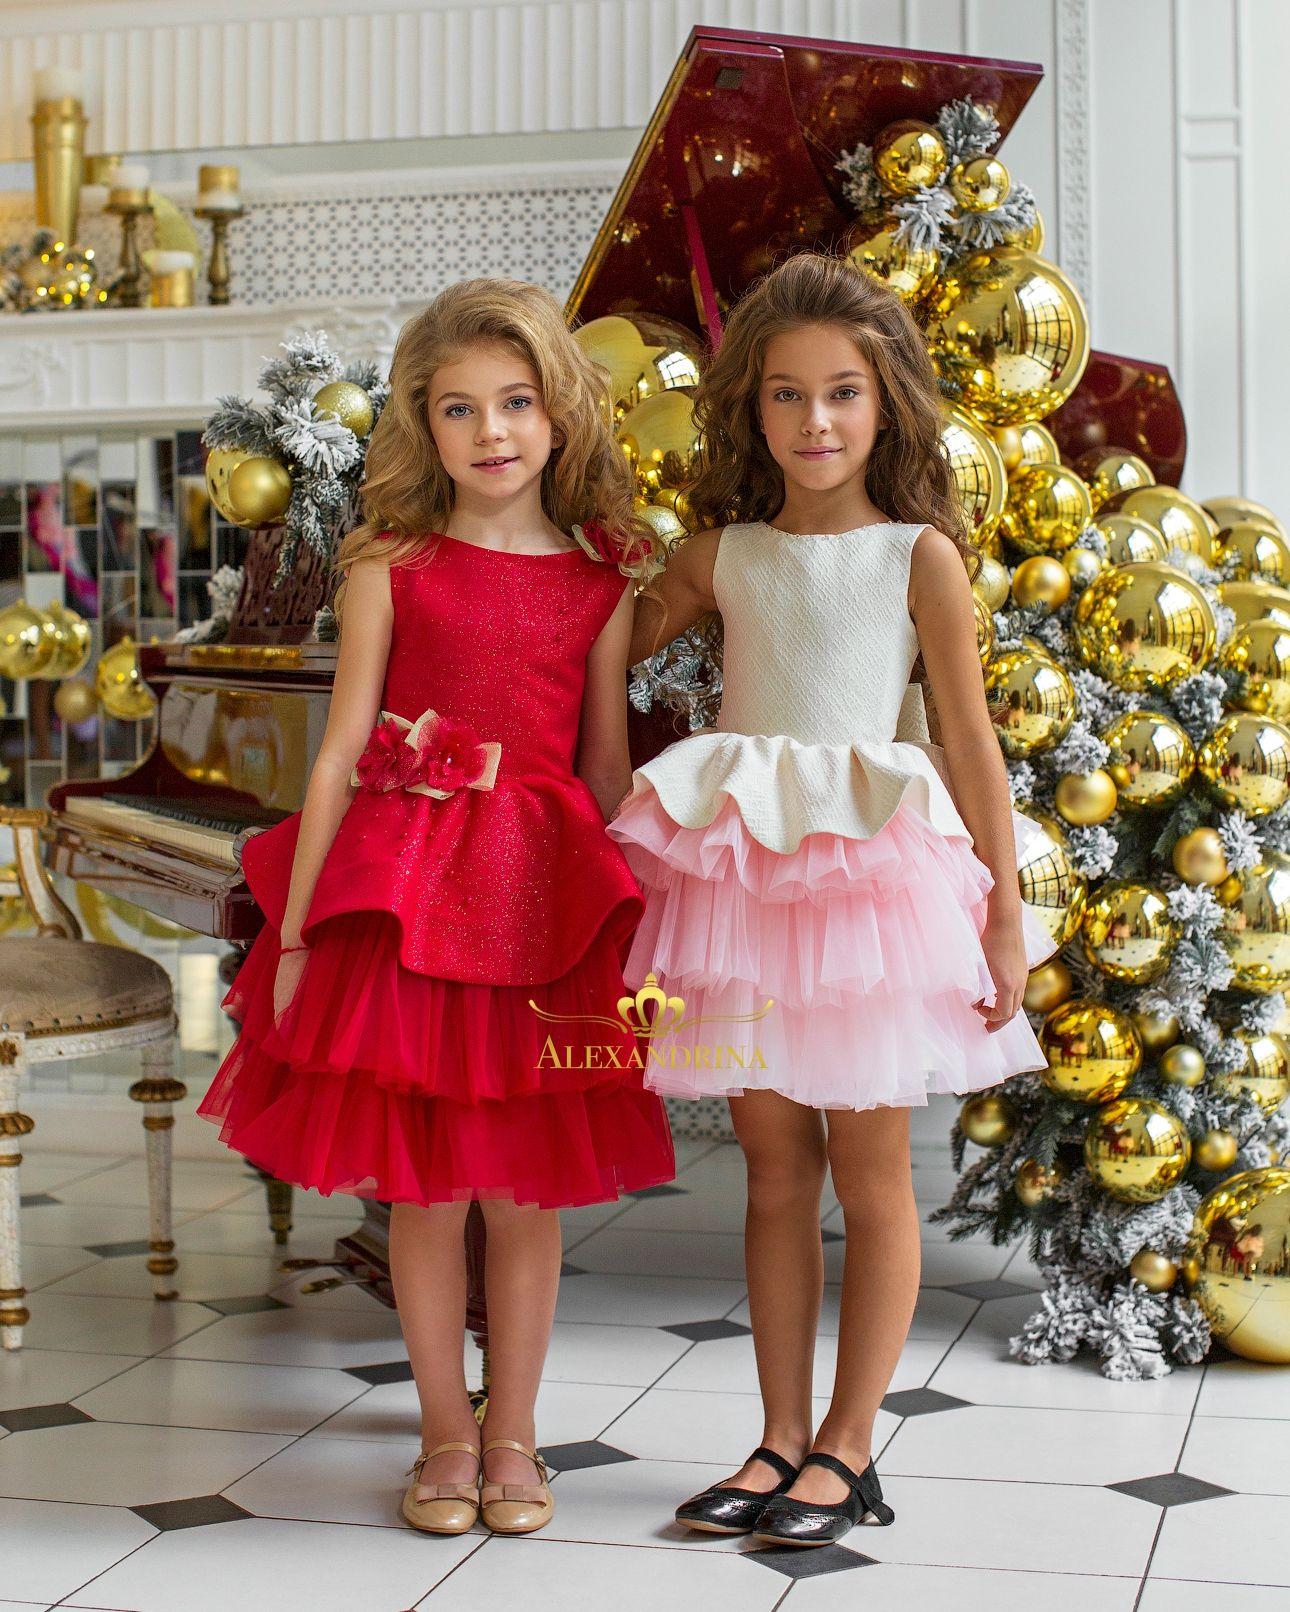 Blush Pinkdress Bobbydaleearnhardt.com